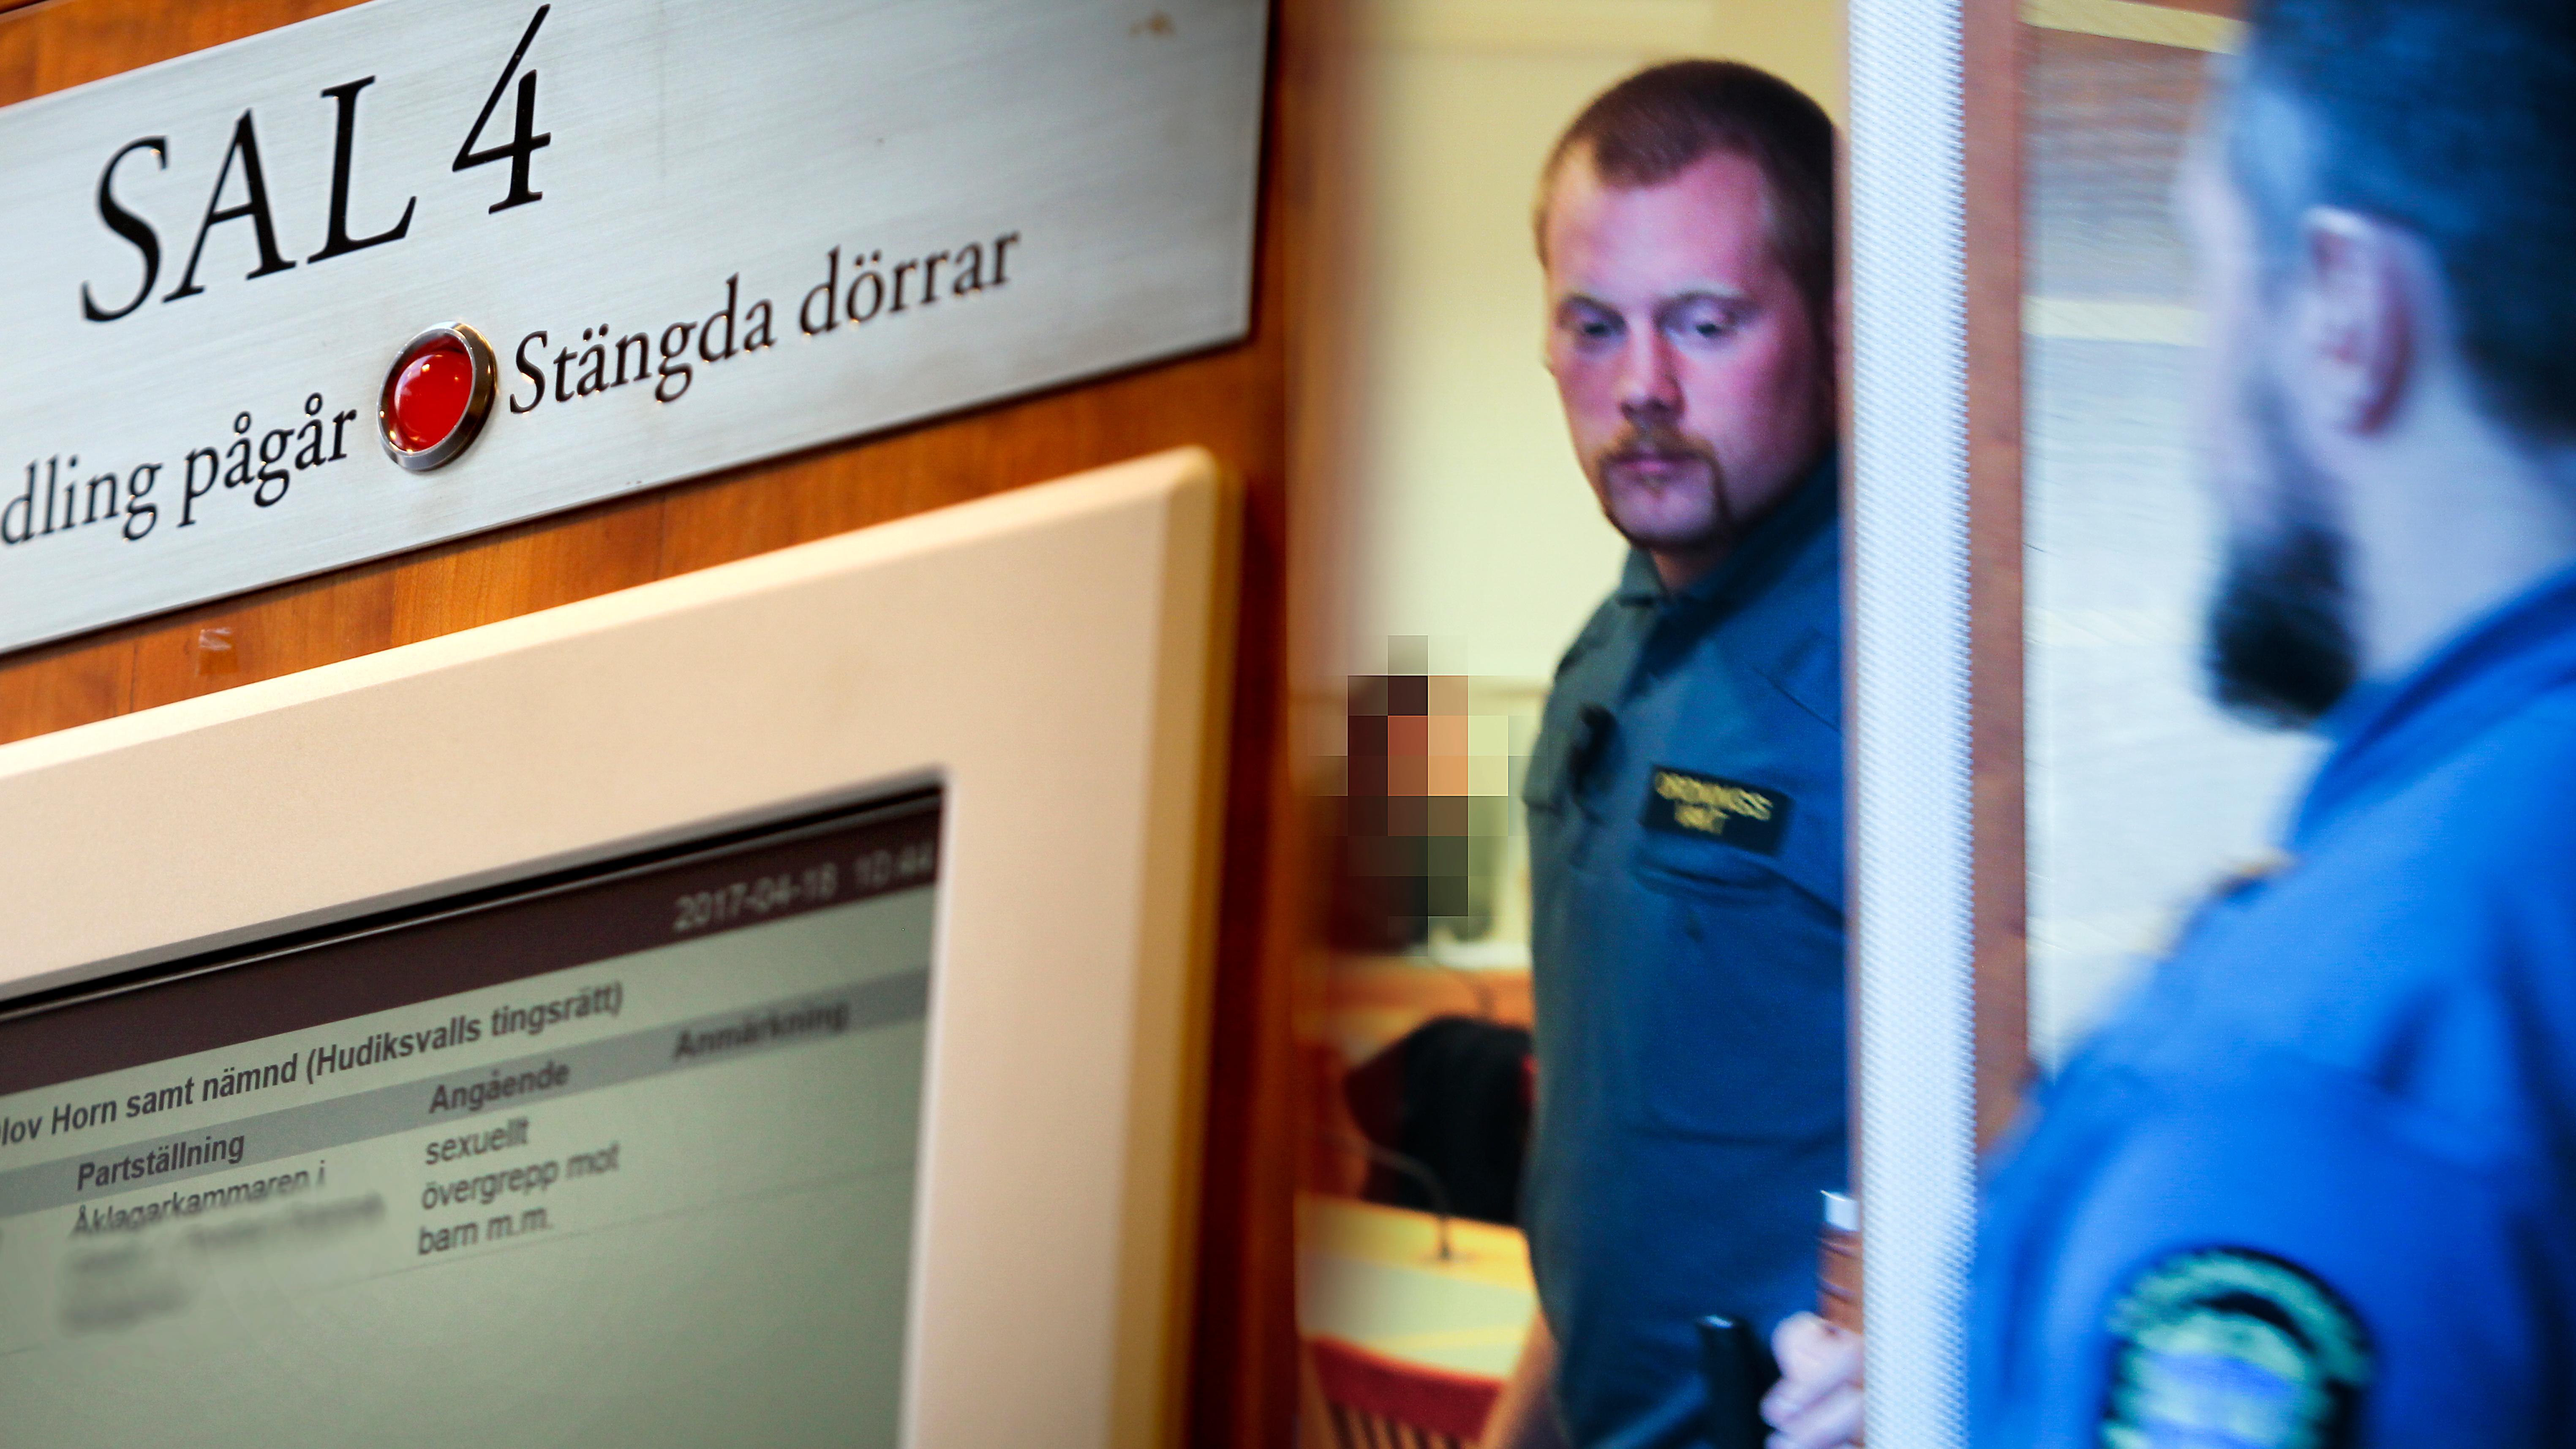 Skola anmals for bestraffning